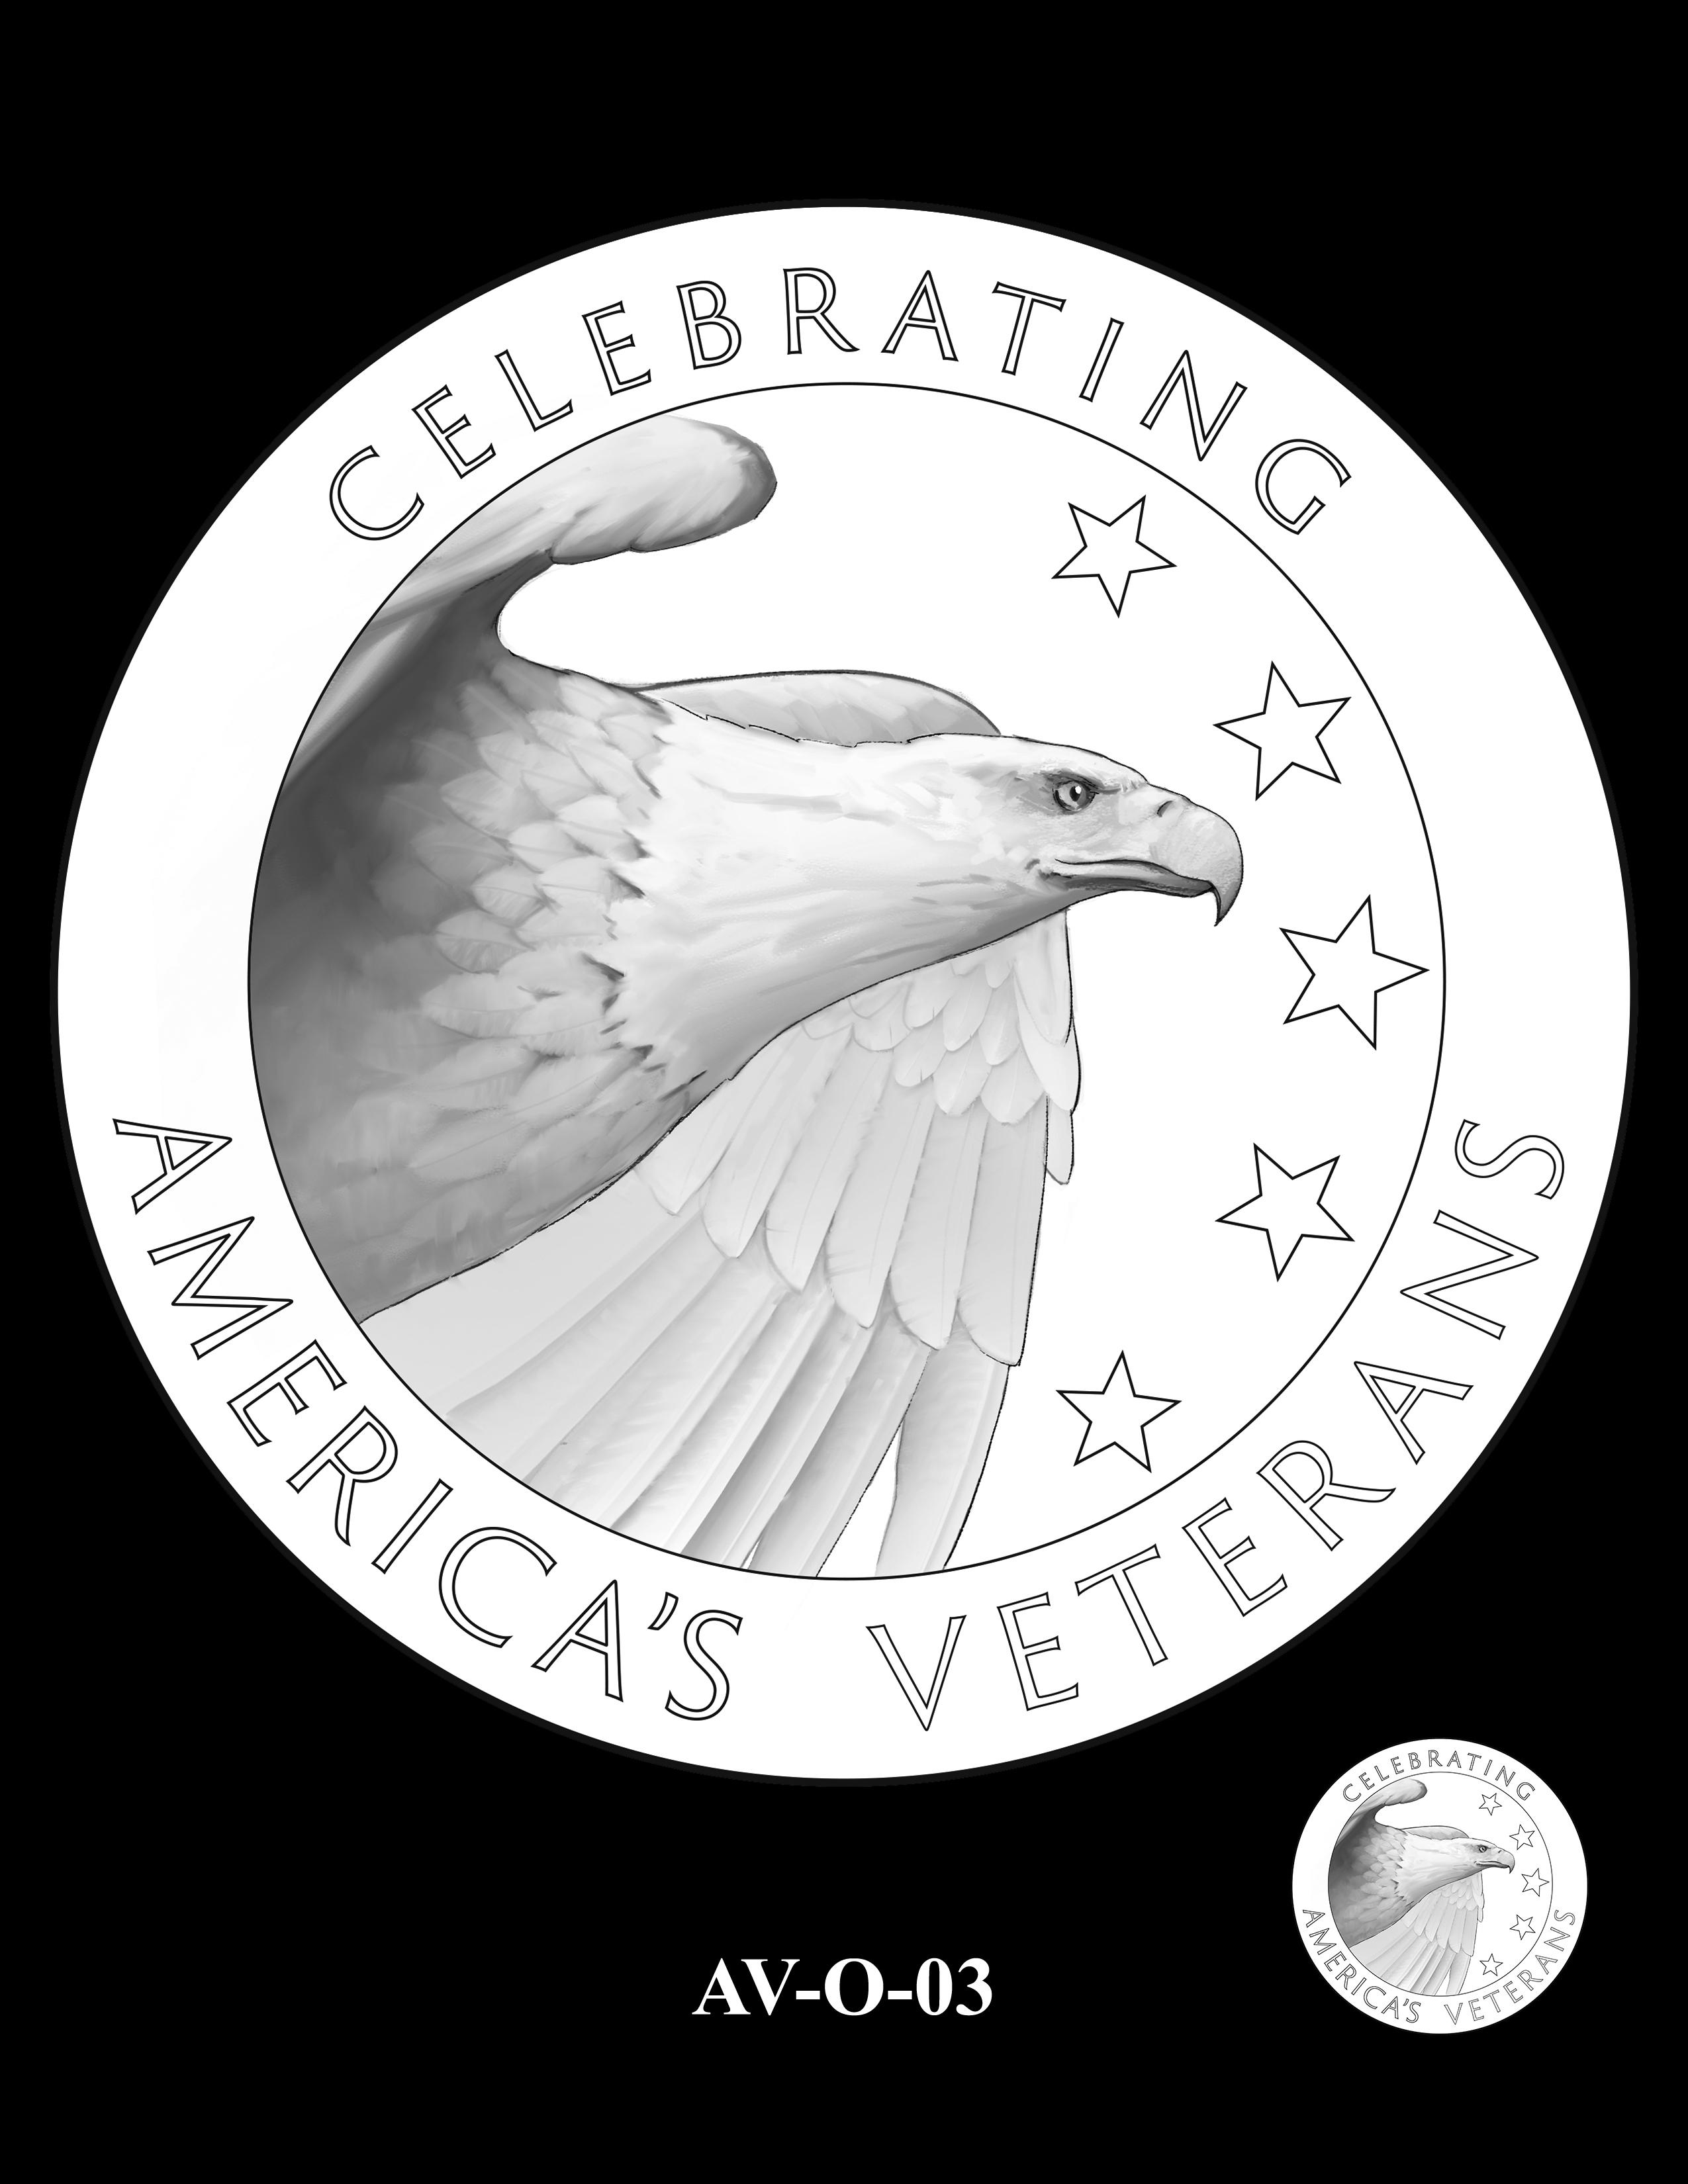 AV-O-03 - American Veterans Medal